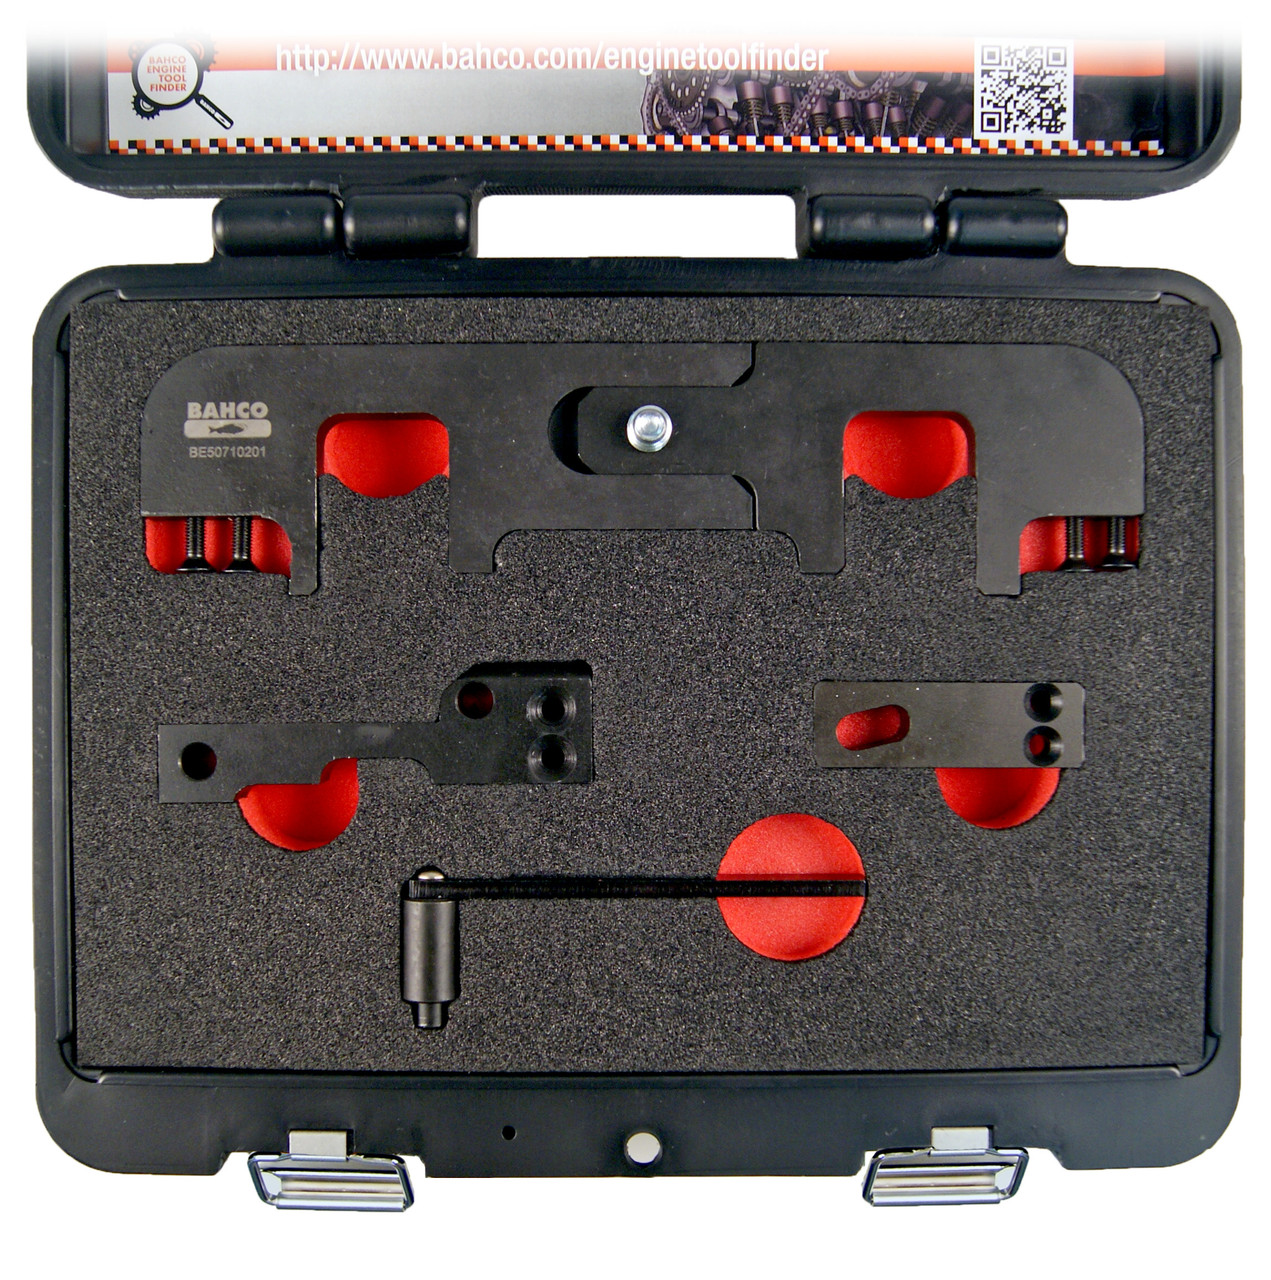 Набор для синхронизации бензиновых мини-двигателей MINI-PSA 1.4-1.6, Bahco, BE507102